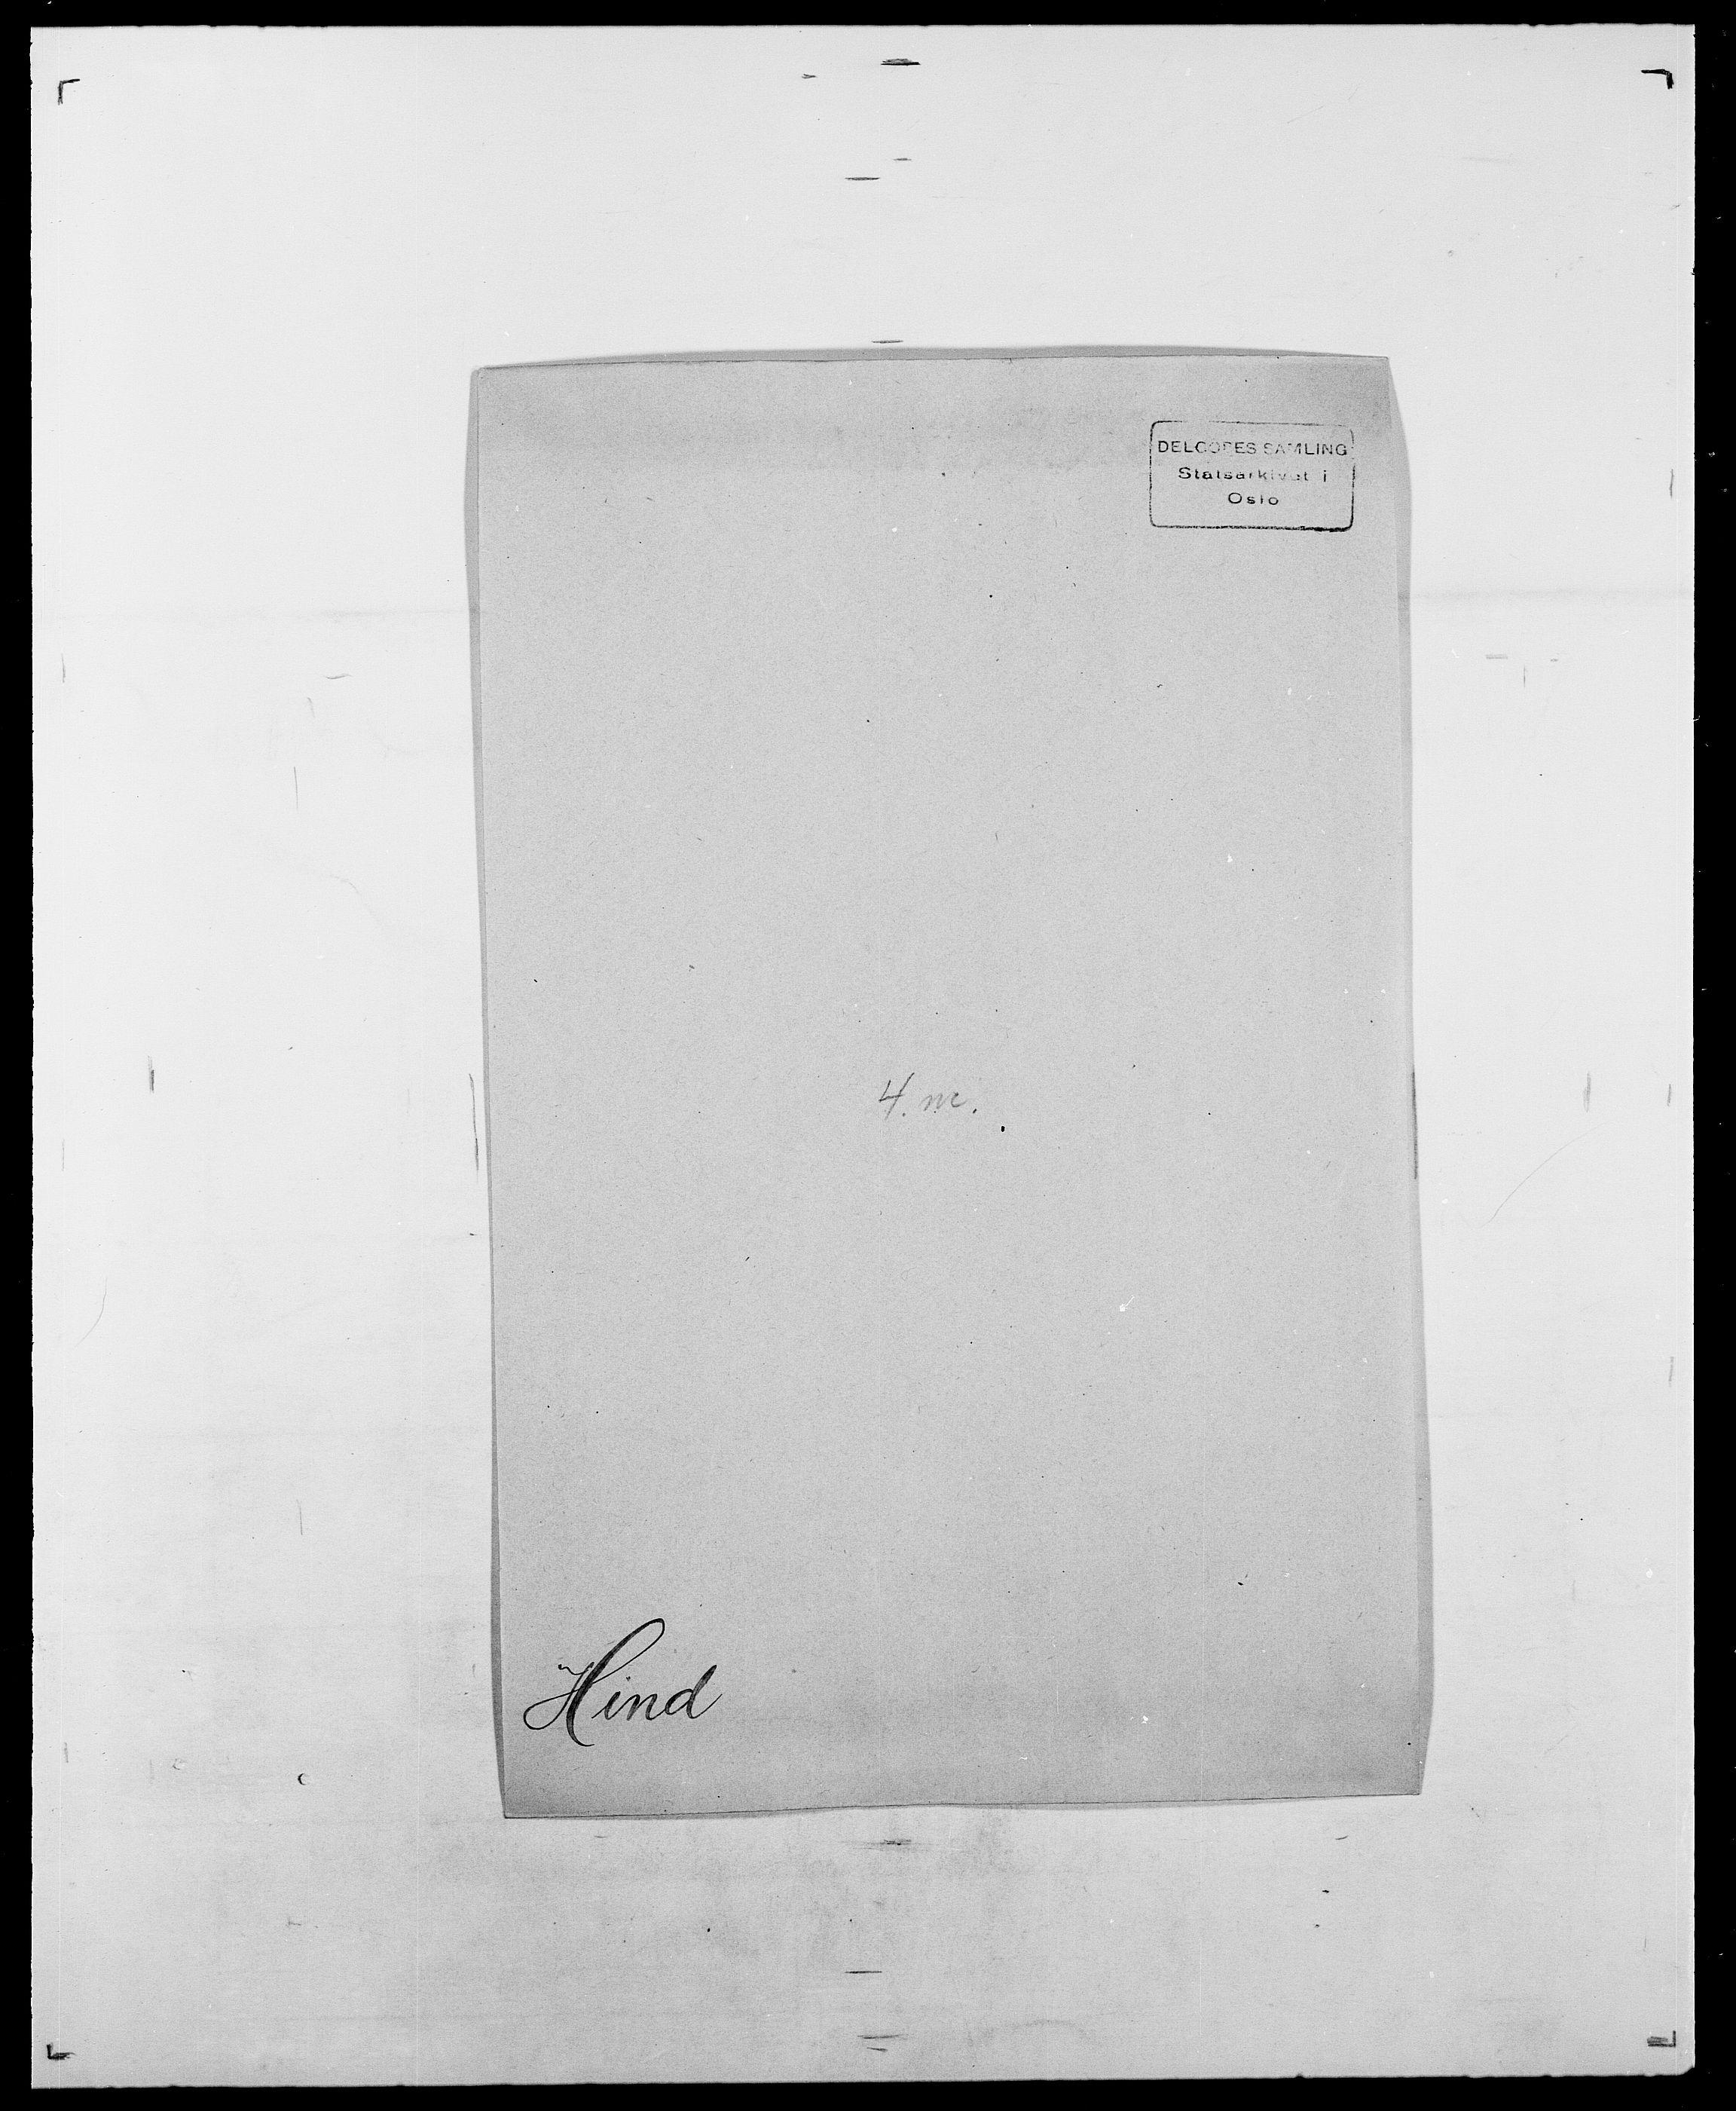 SAO, Delgobe, Charles Antoine - samling, D/Da/L0017: Helander - Hjørne, s. 454